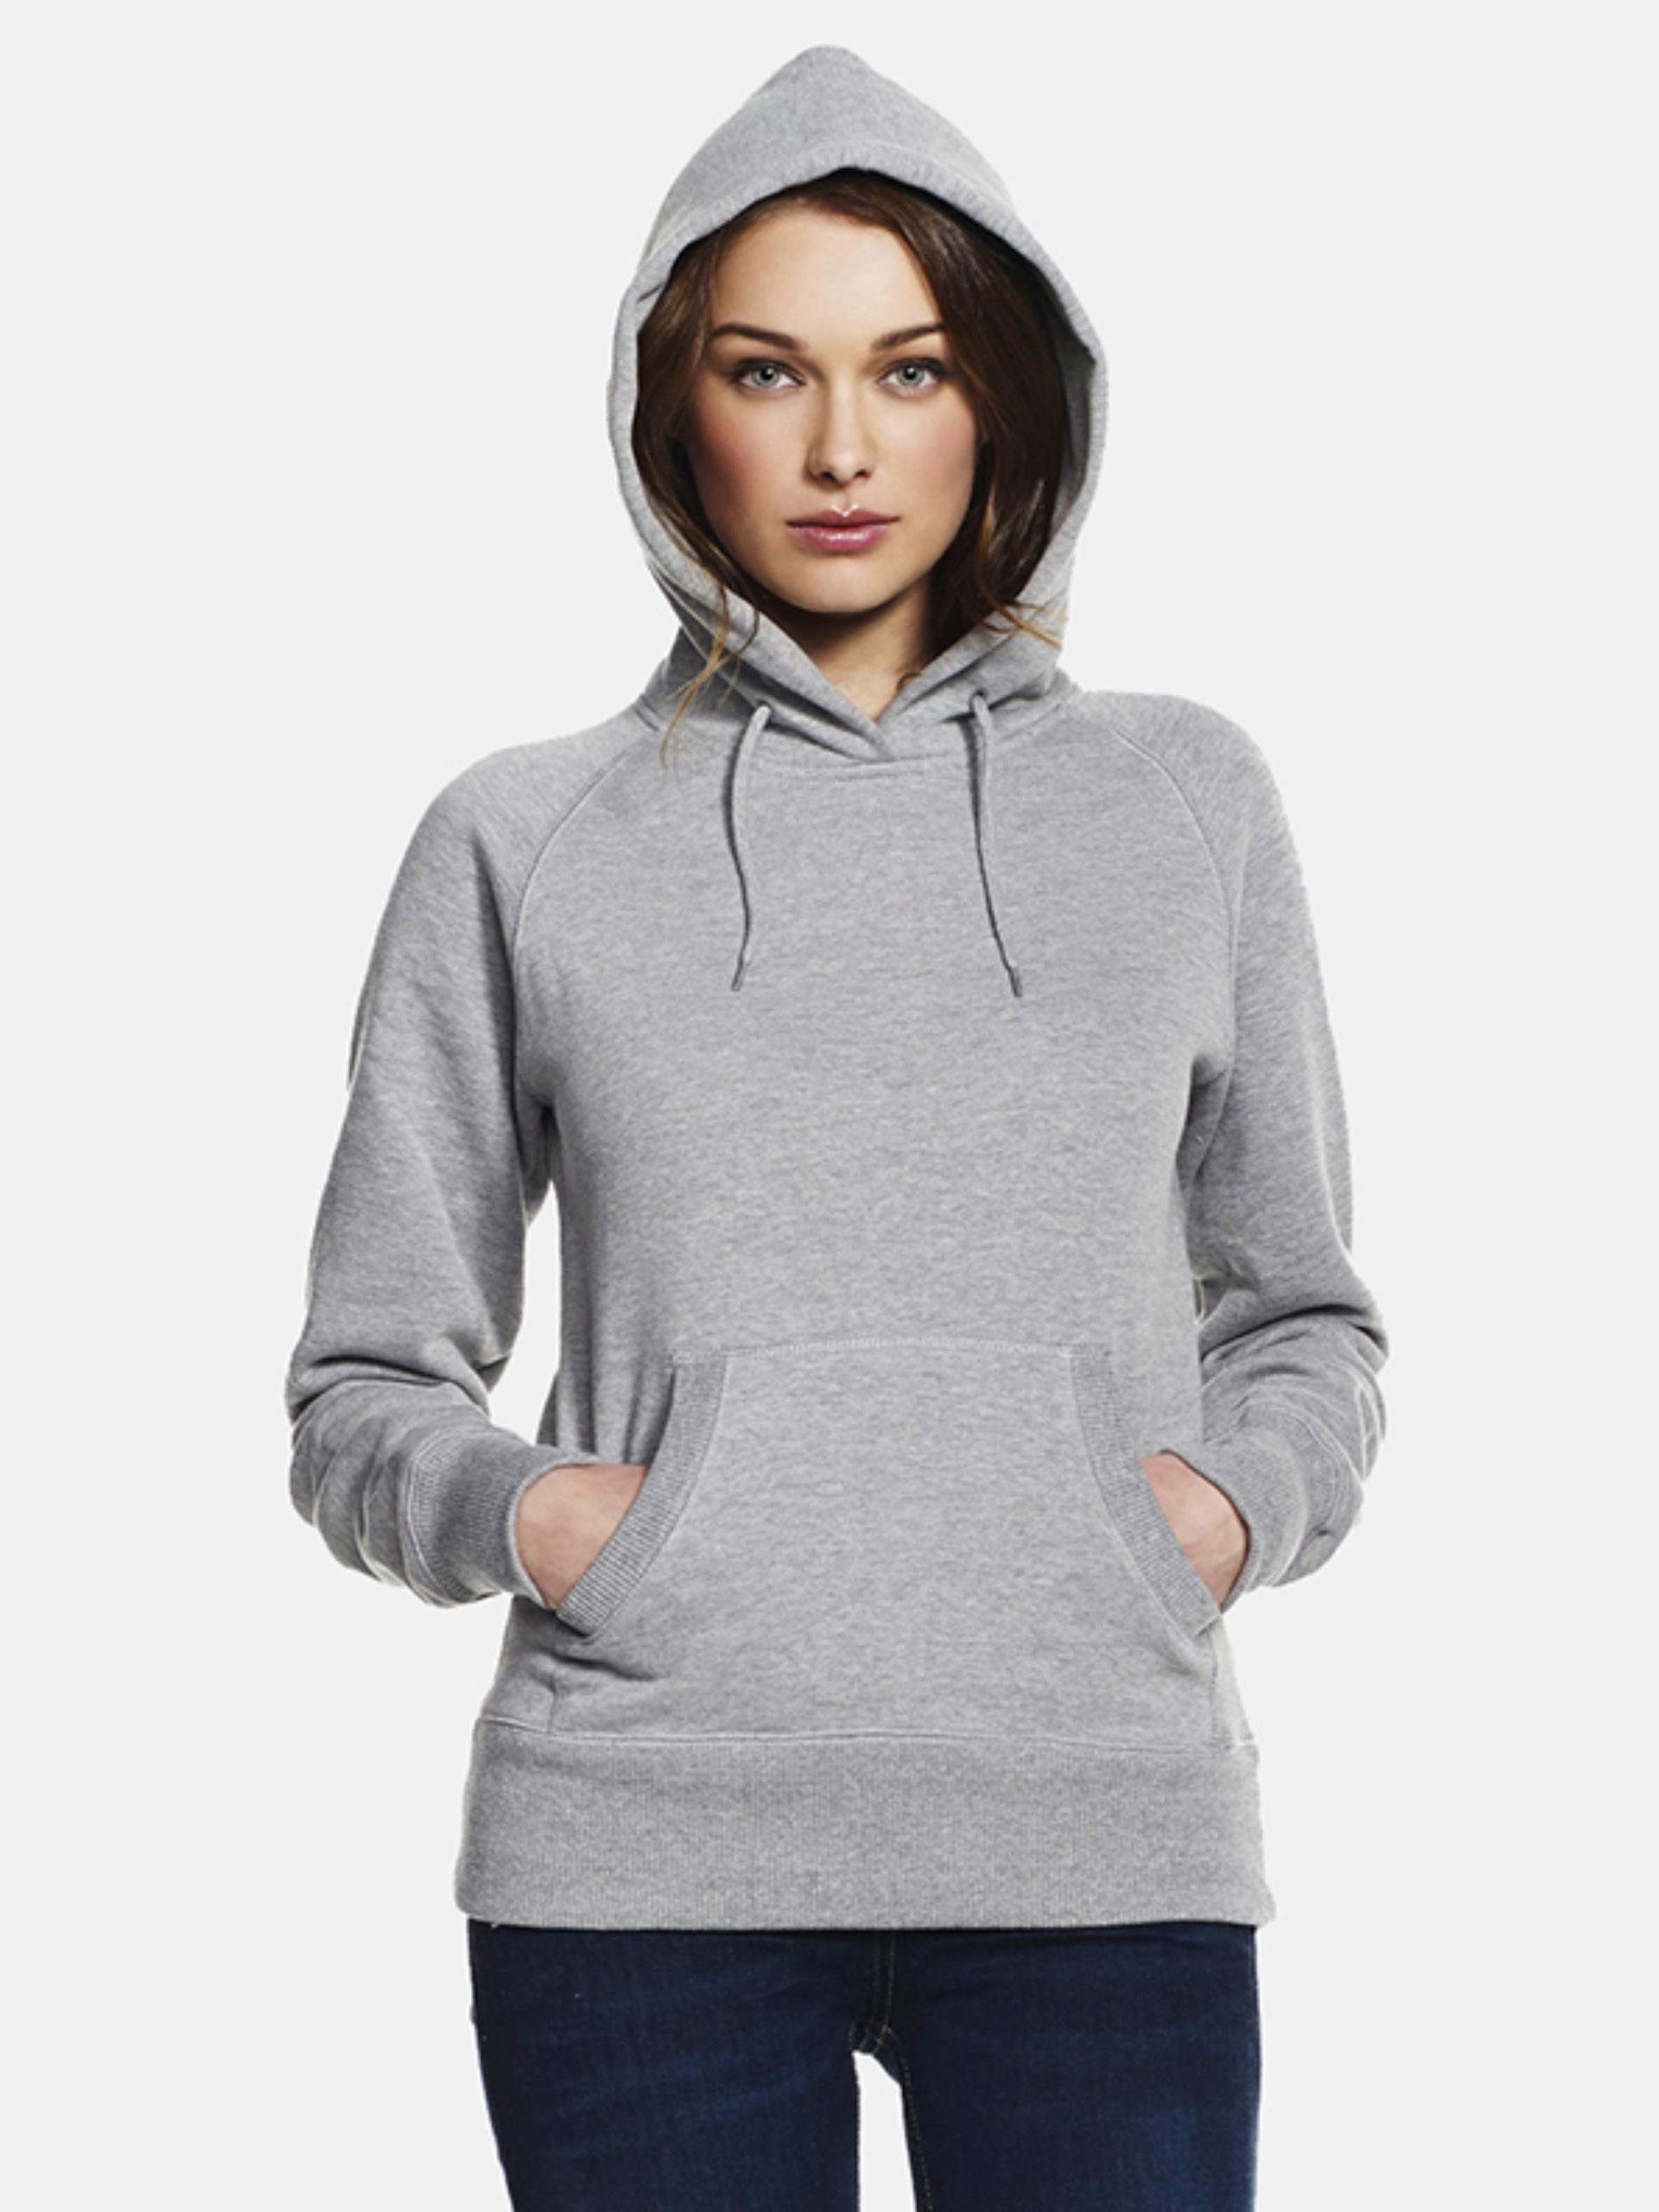 Damen Sweatshirt Continental N53p Modell